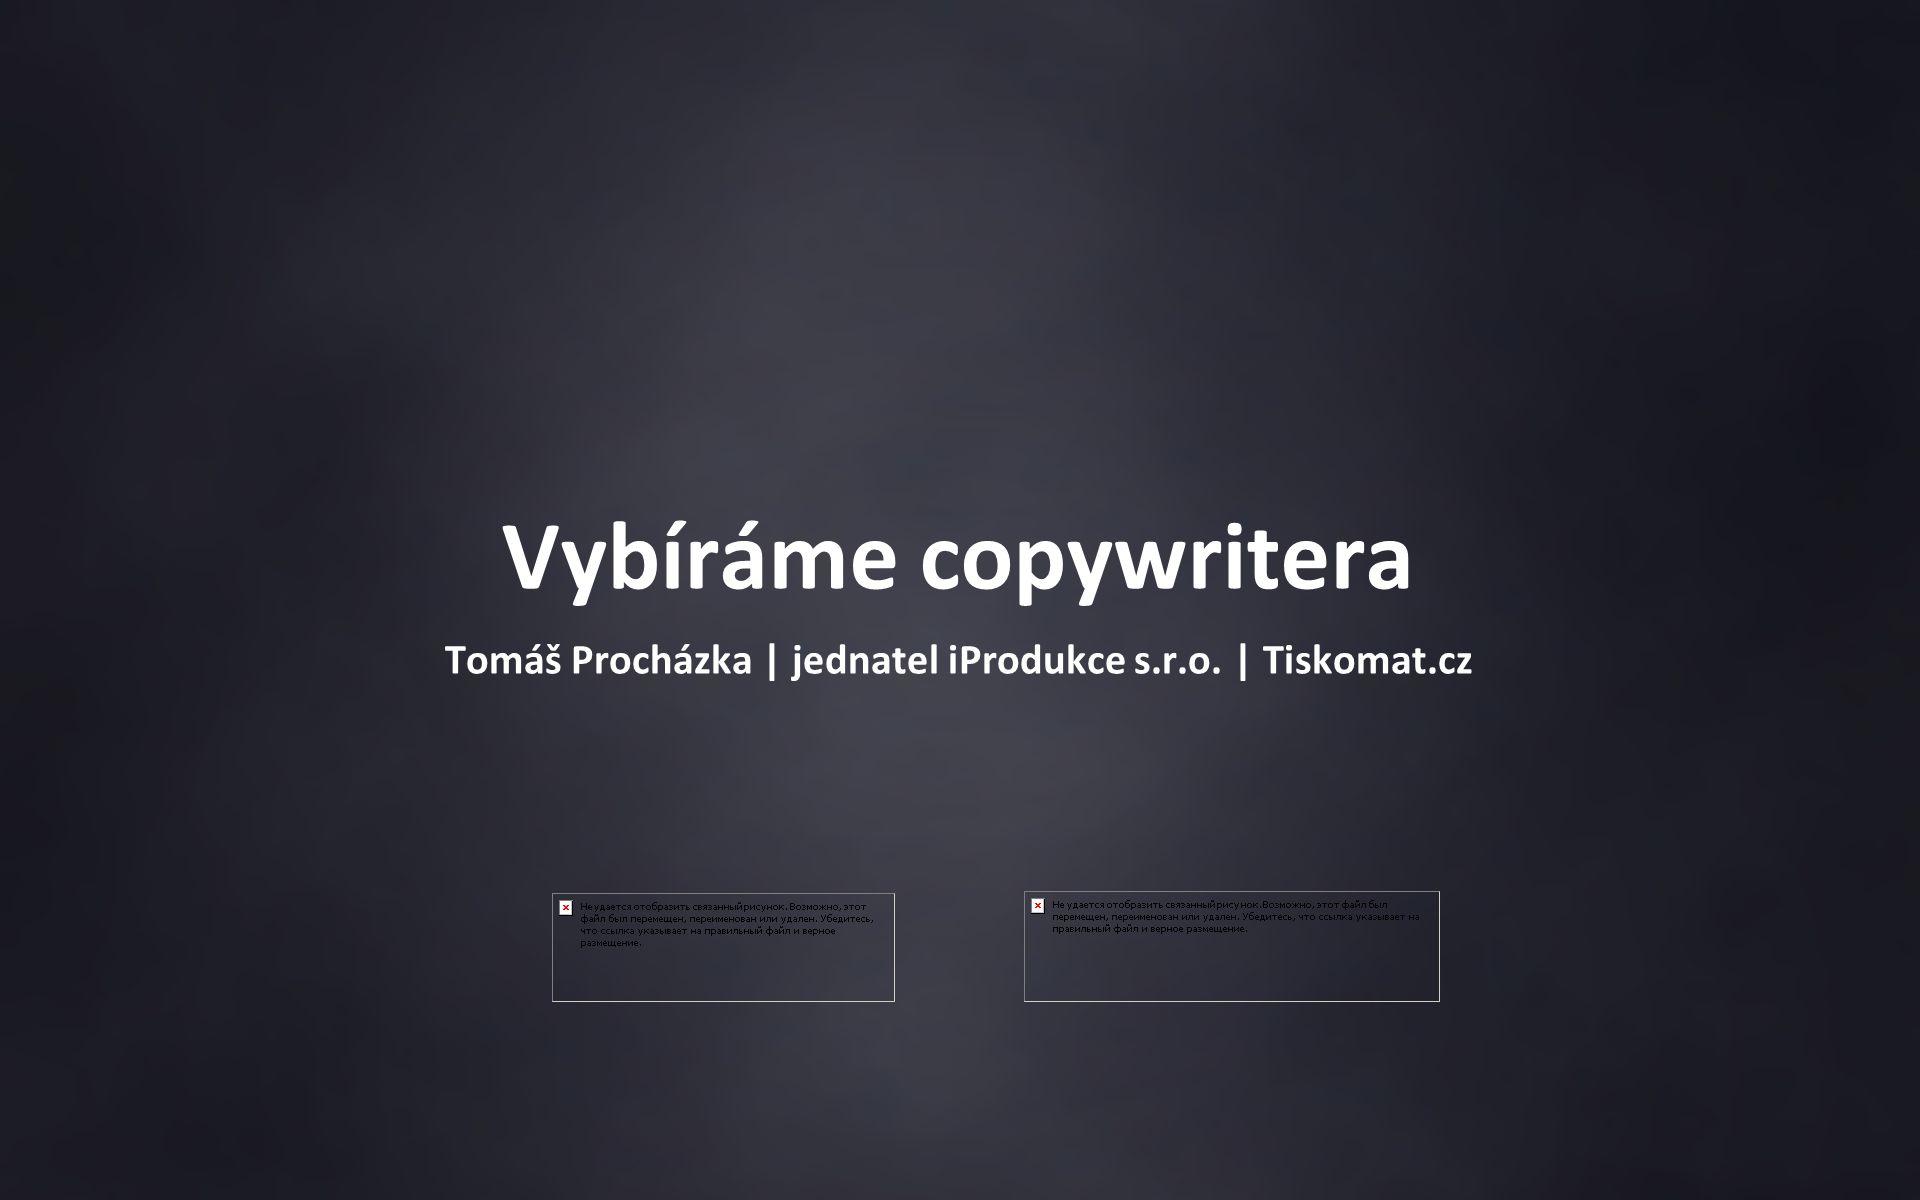 iProdukces.r.o webdevelopment a online marketing Naši klienti: ČTK, T-mobile, Goram, iInfo, WebExpo, OBI, Volvo Homolka..